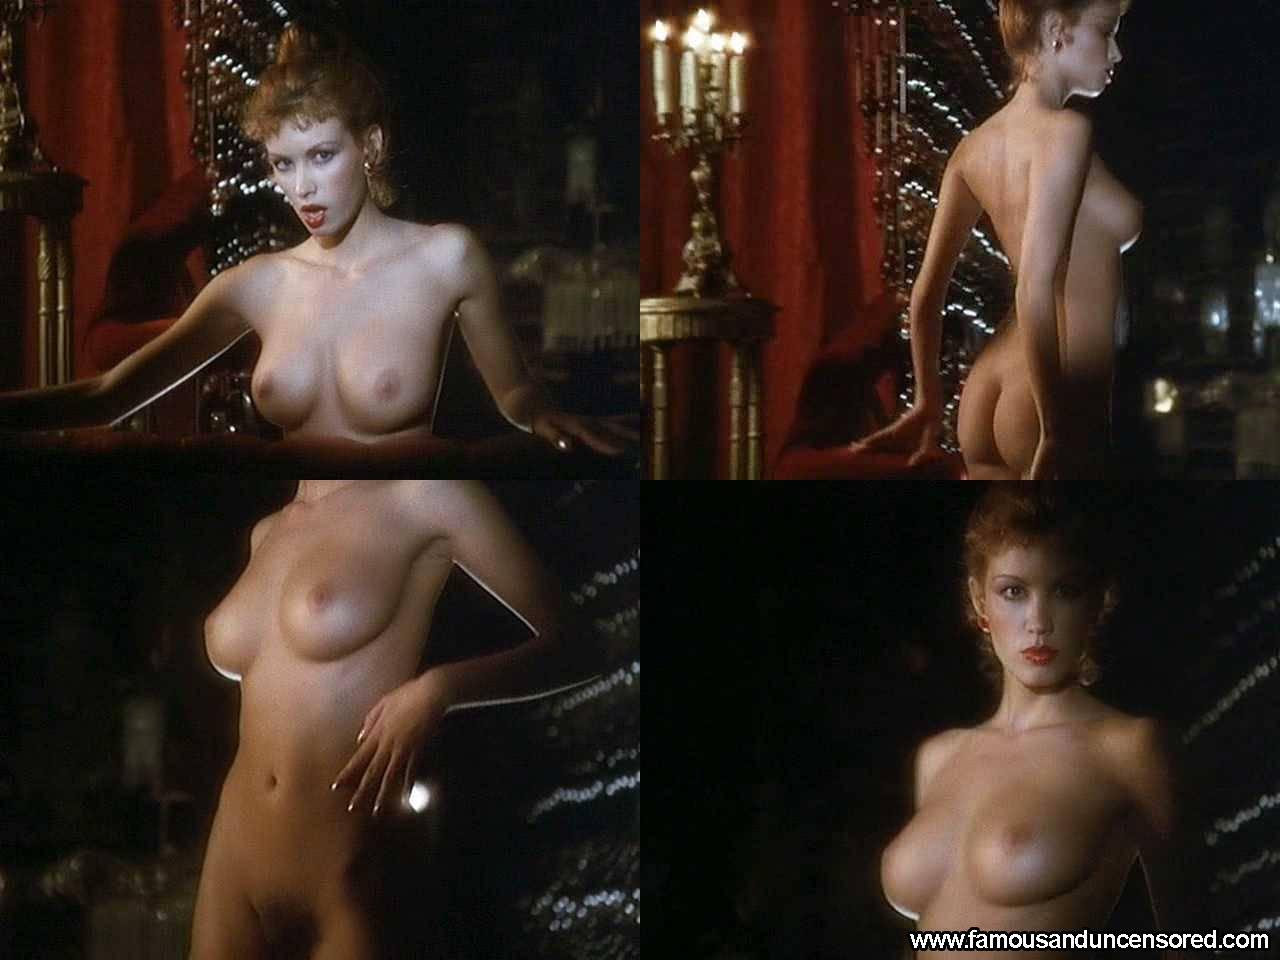 Габриэлла мариани порно фейки подделки — photo 5